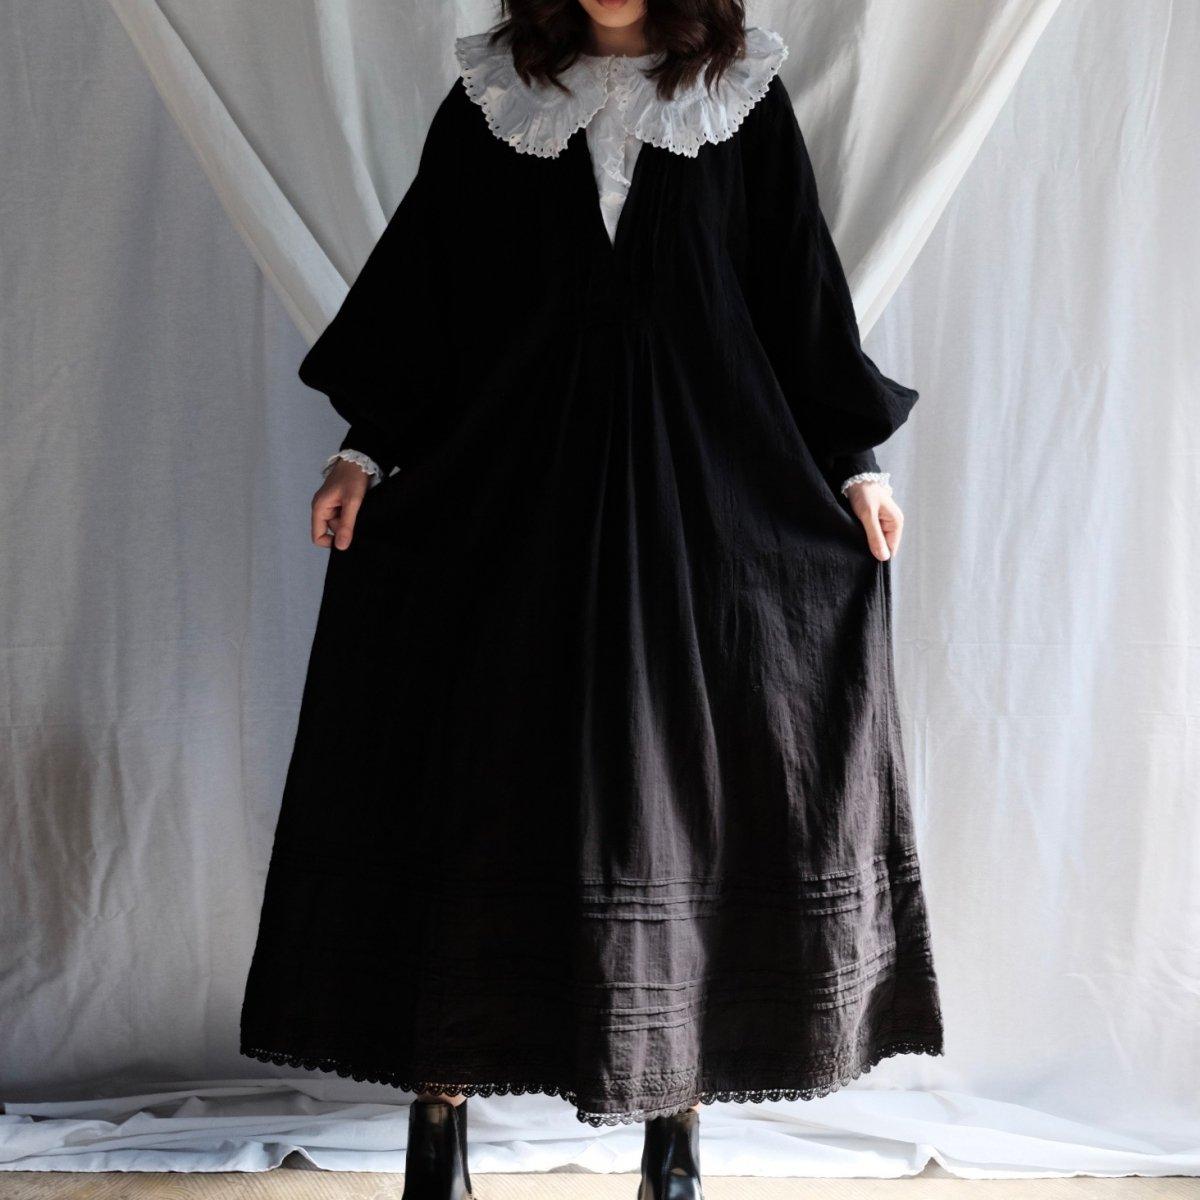 [VINTAGE] Romanian new moon black dress